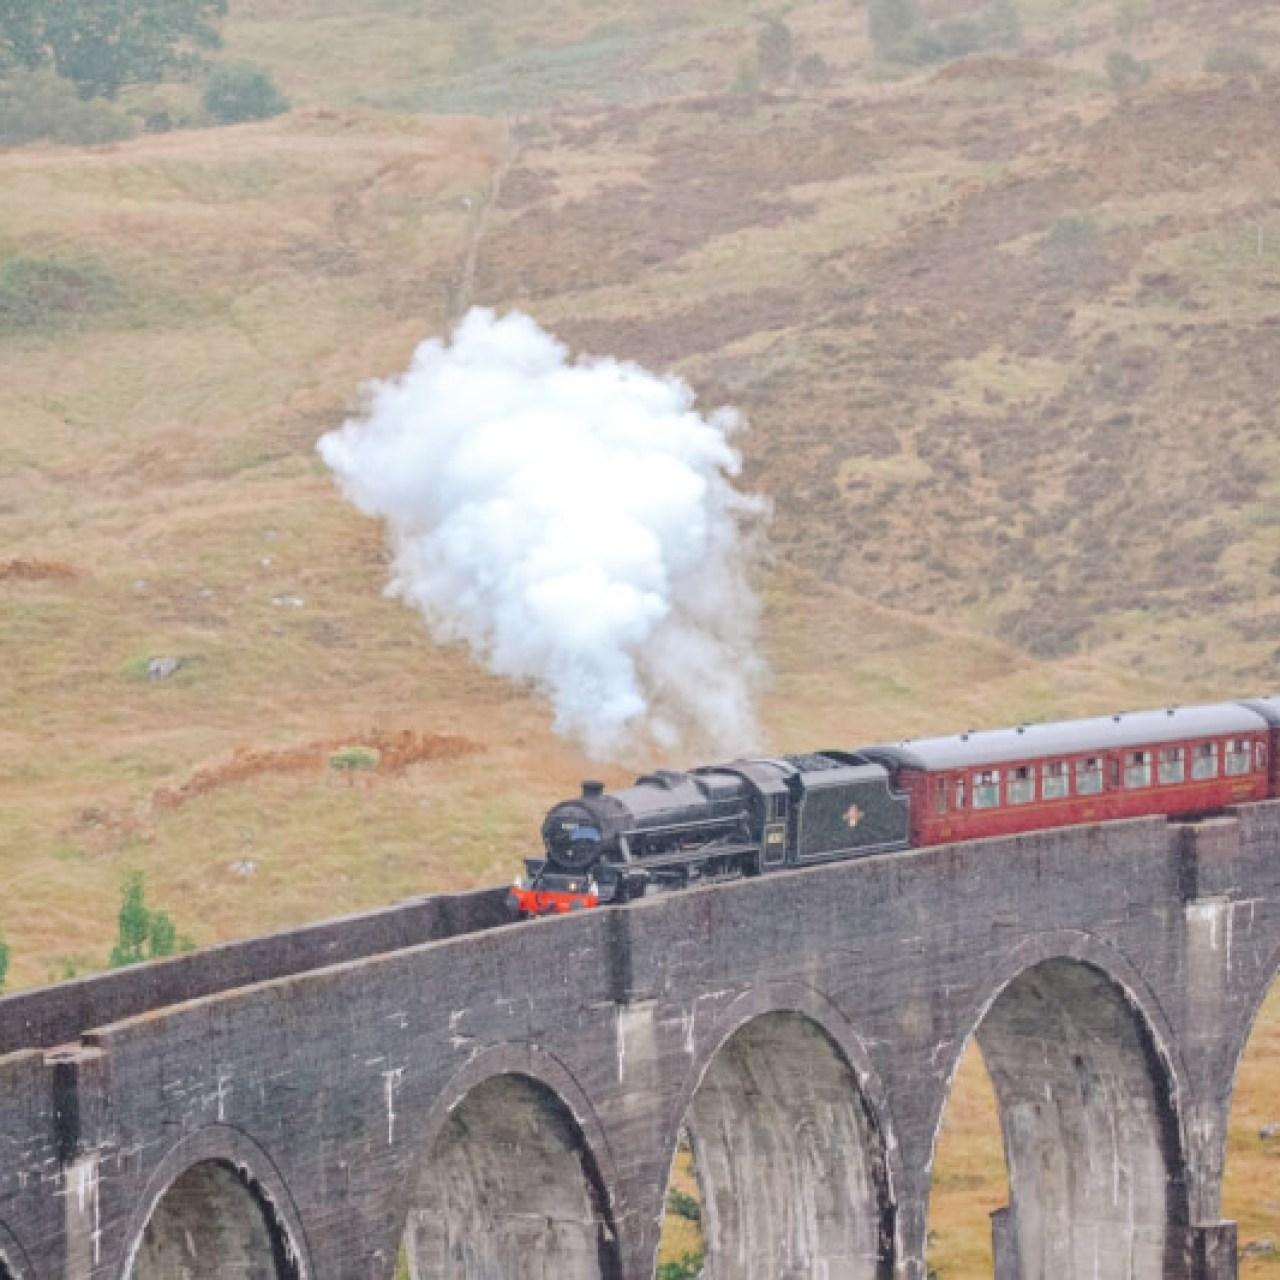 image the Hogwart's Express crossing the Glenfinnan Viaduct